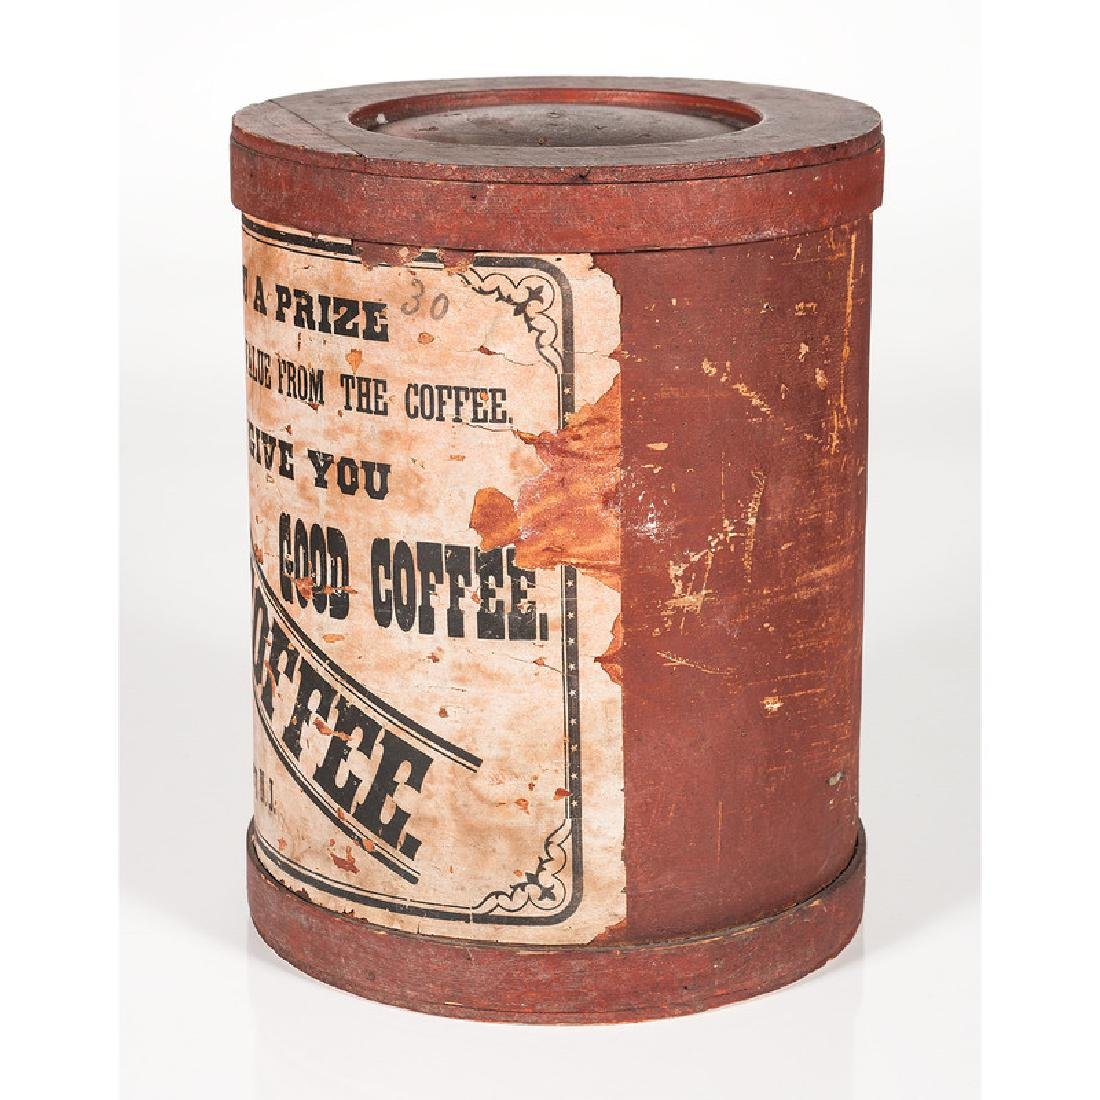 Wood Coffee Bins - 5